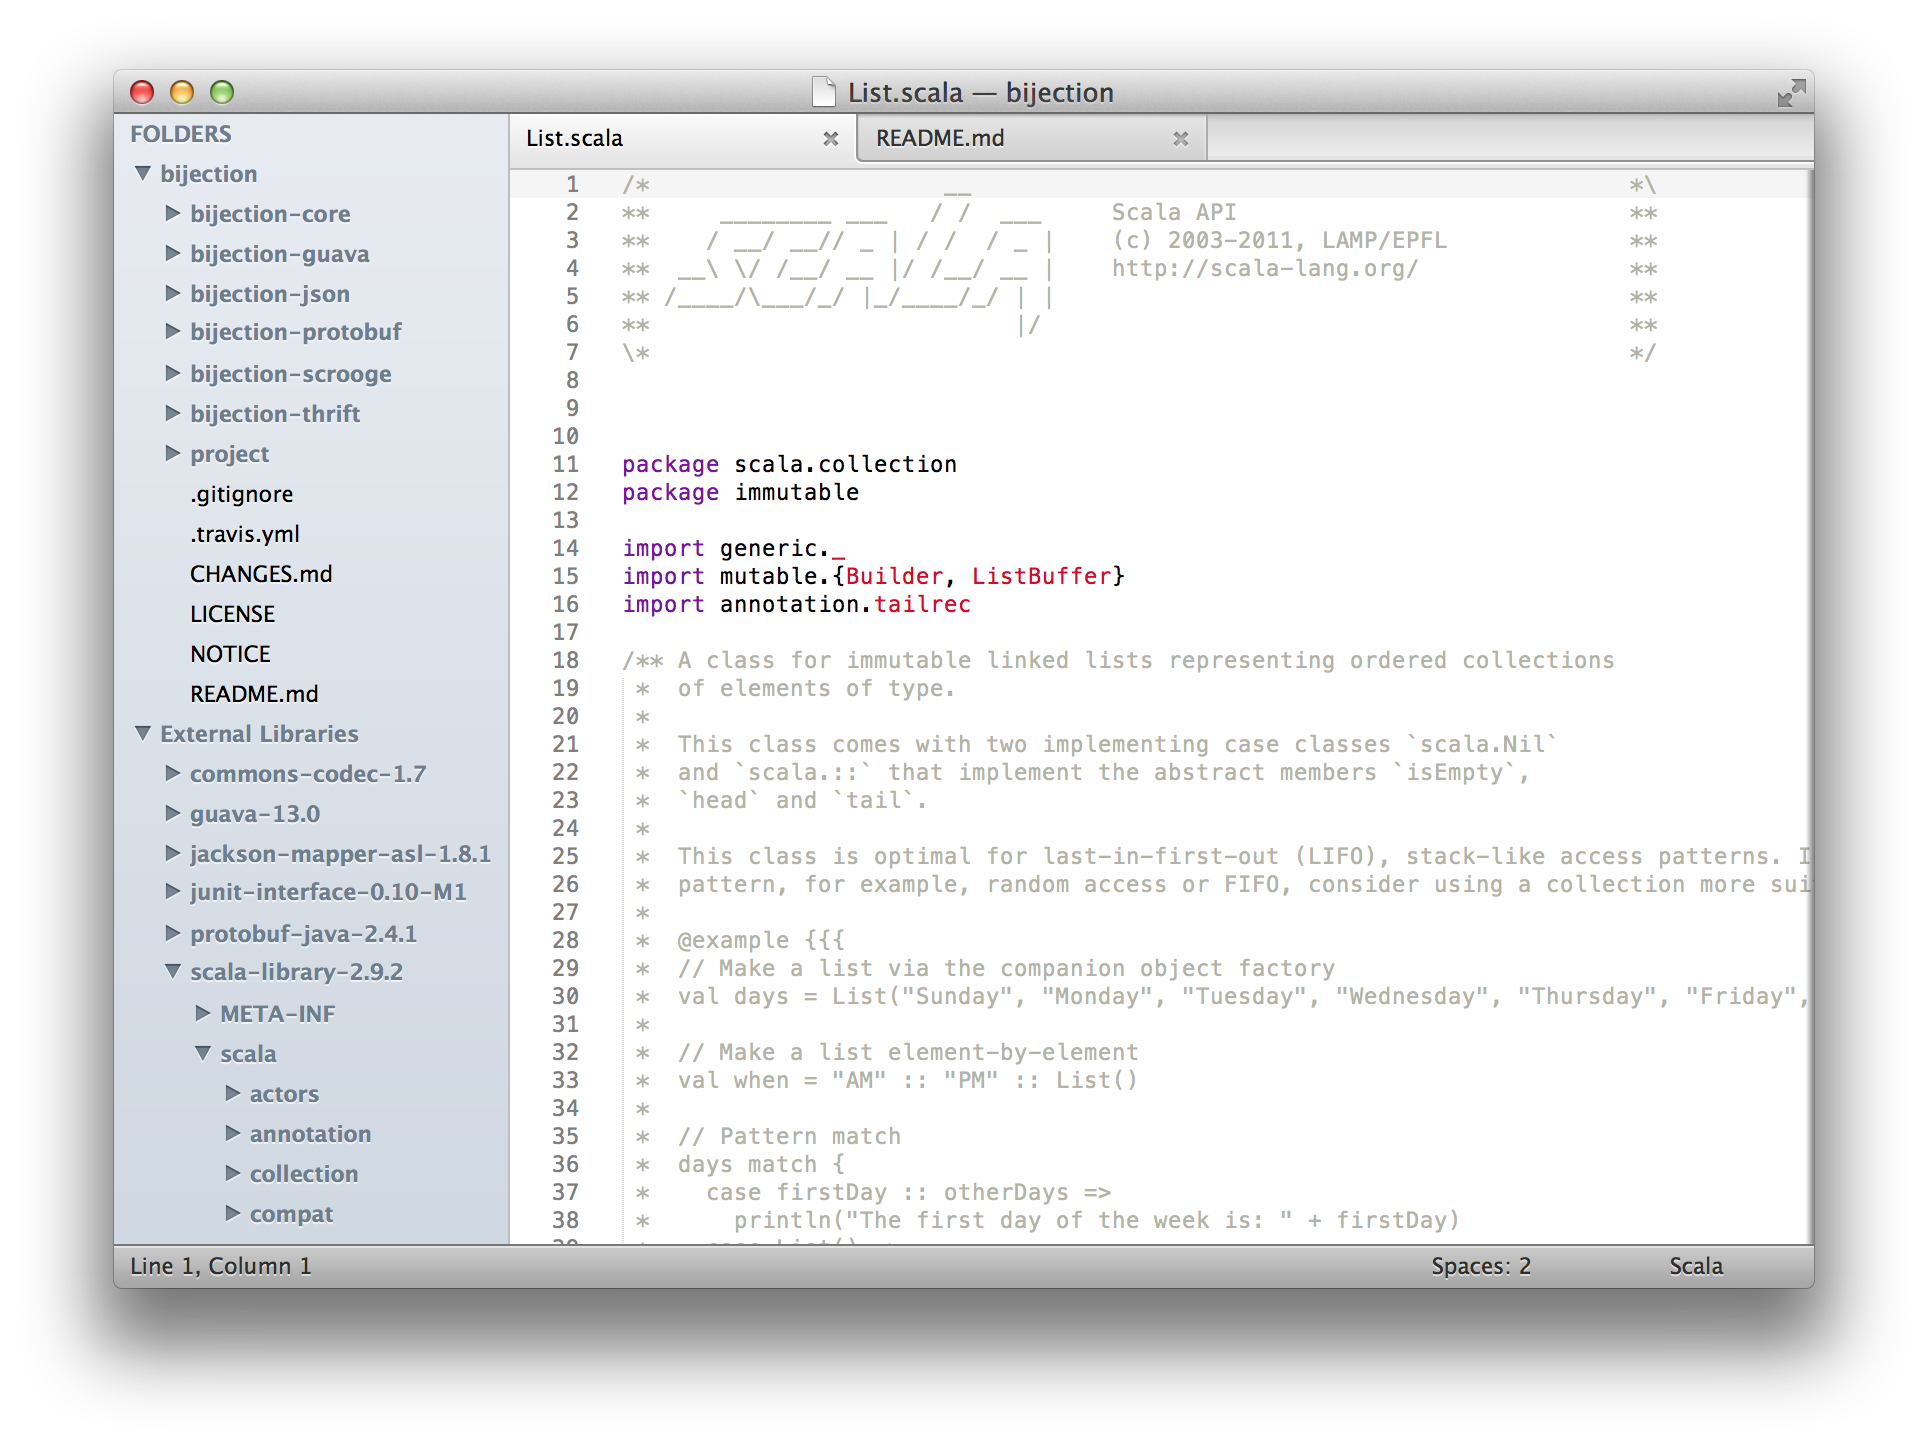 GitHub - orrsella/sbt-sublime: An sbt plugin for generating